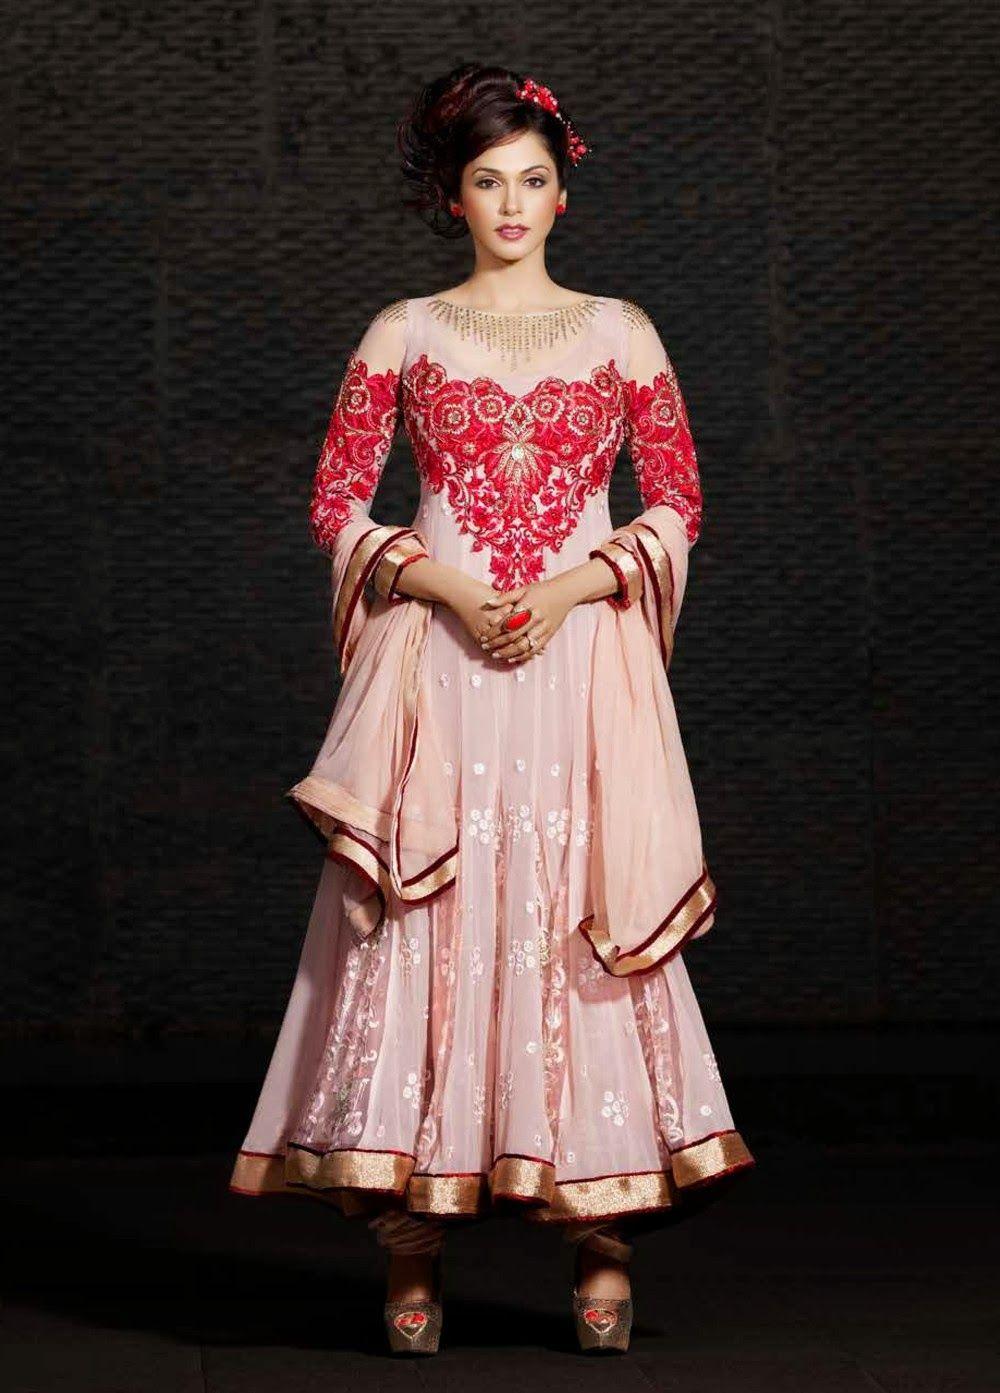 Stylish white dress wedding umbrella frocks churidar designs - Umbrella Frock Type Light Pink Dress